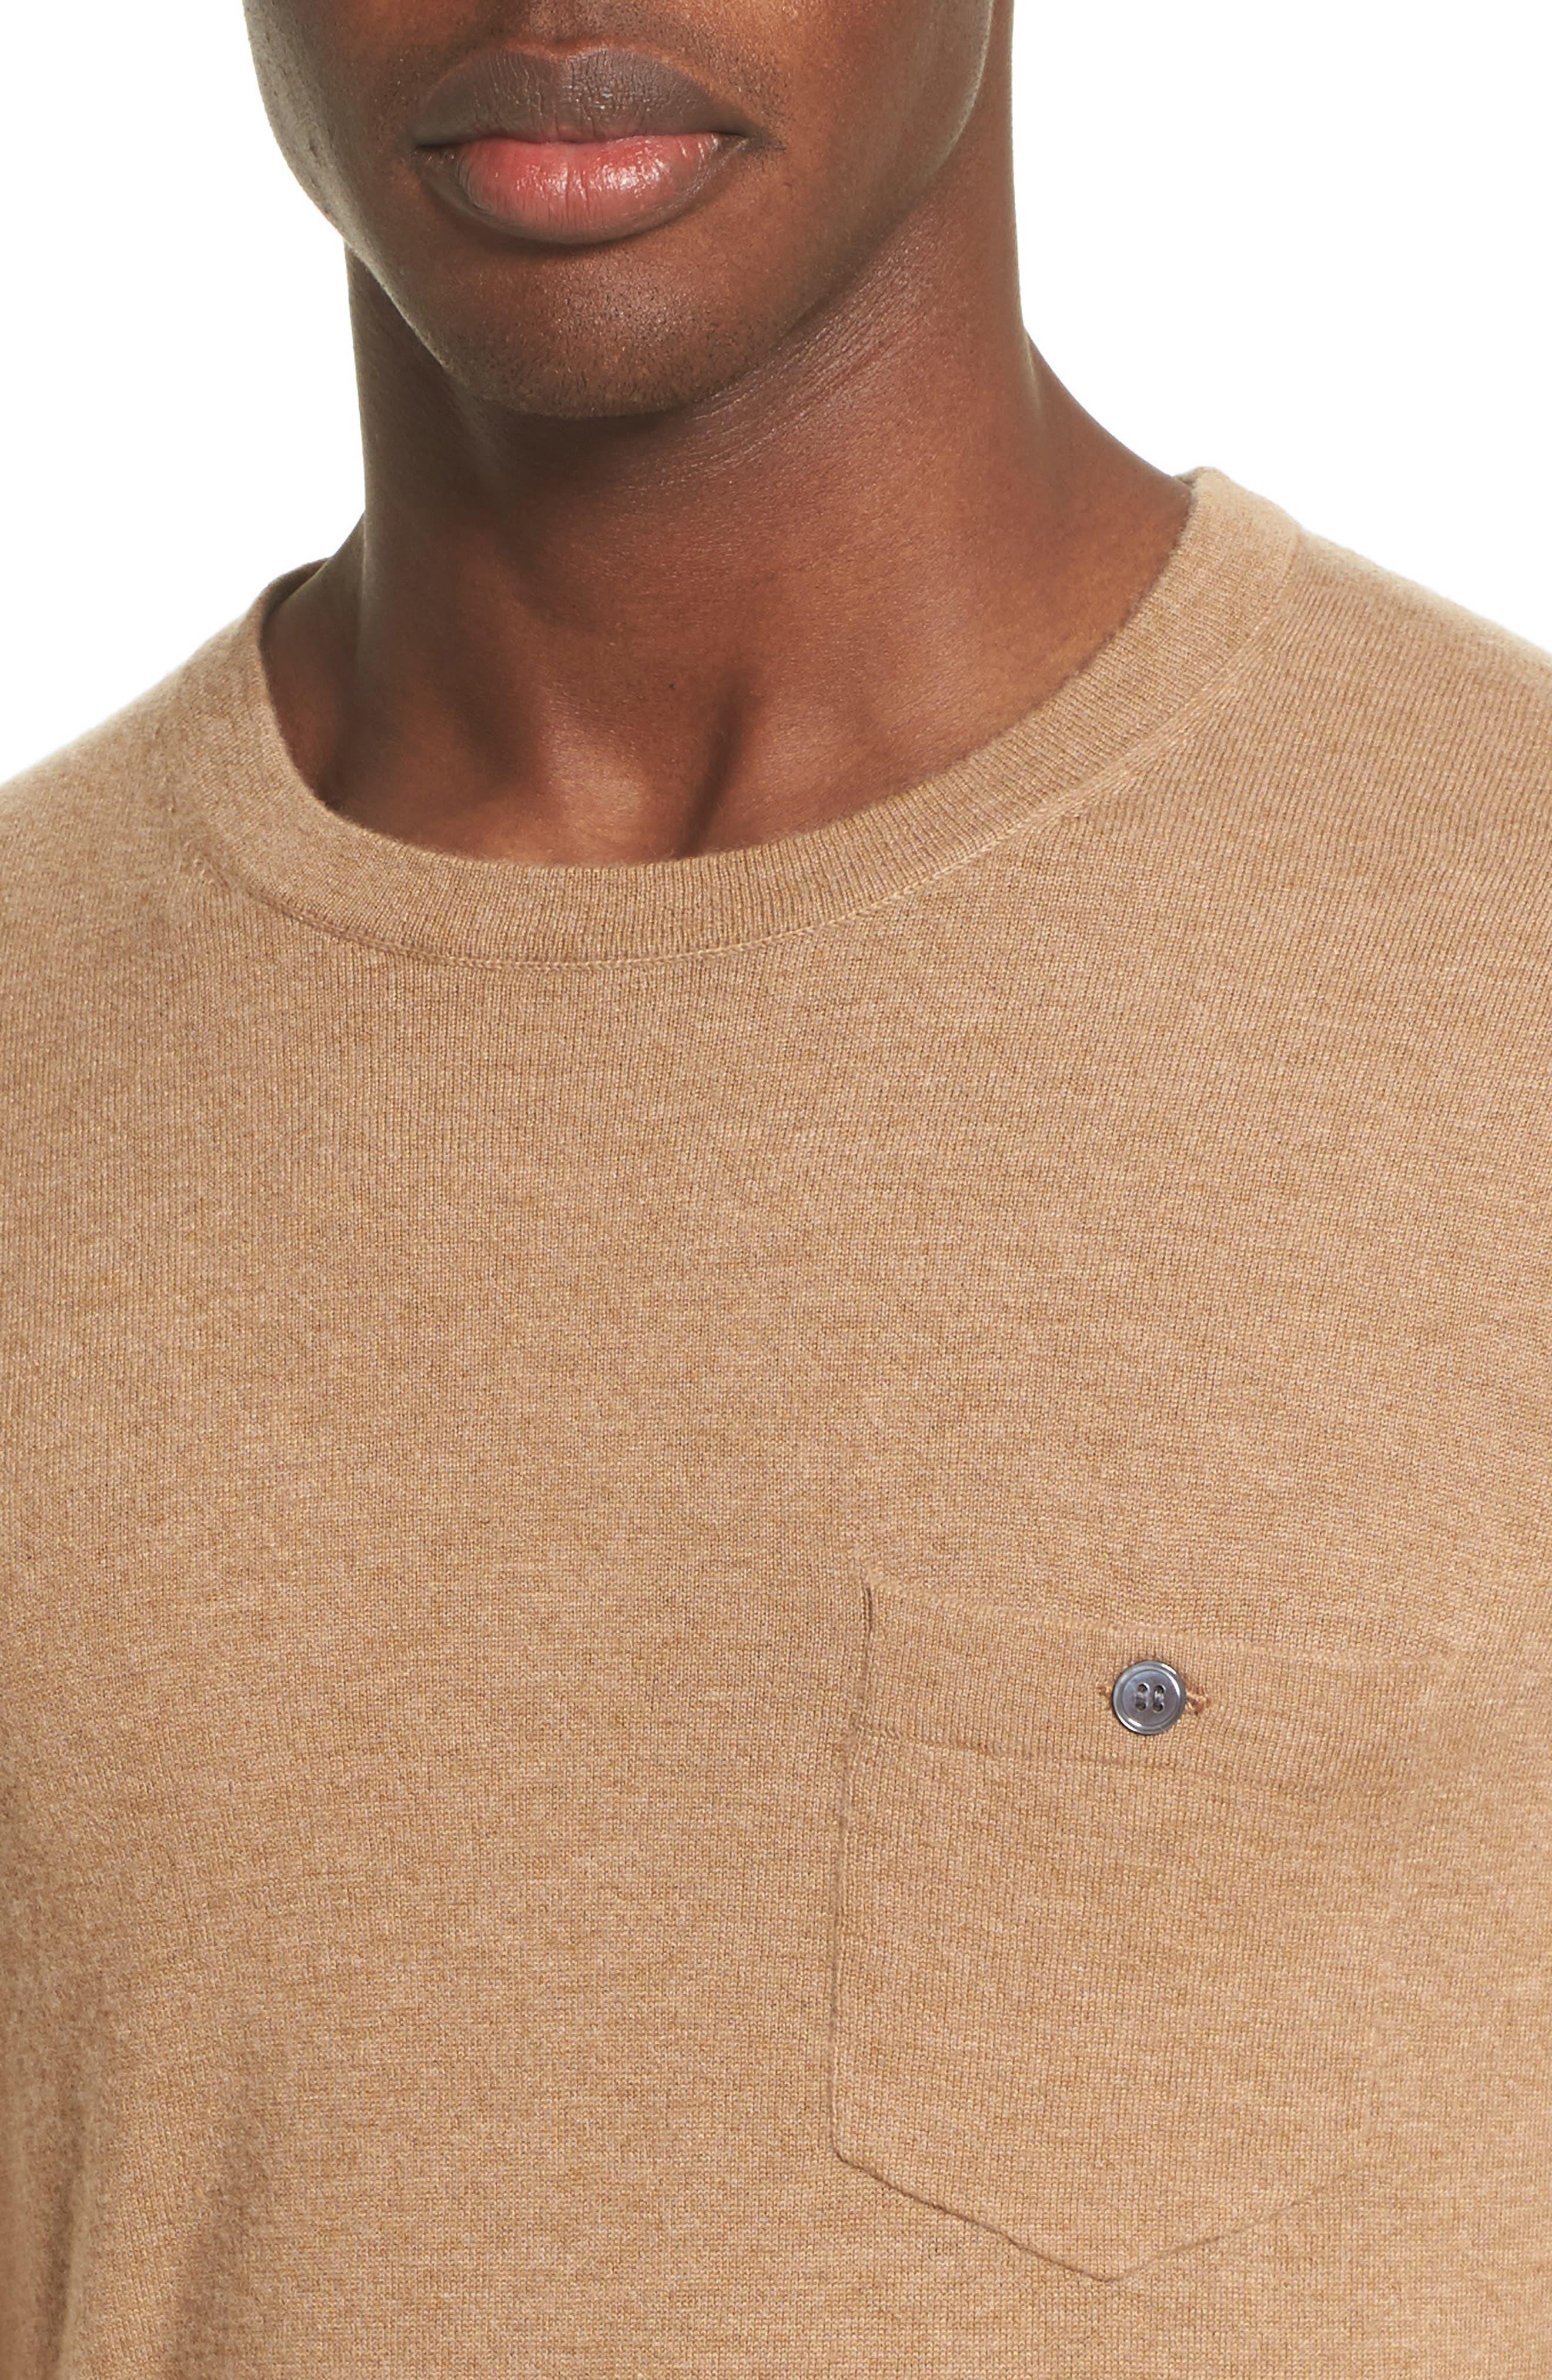 Cashmere Pocket T-Shirt,                             Alternate thumbnail 4, color,                             Camel